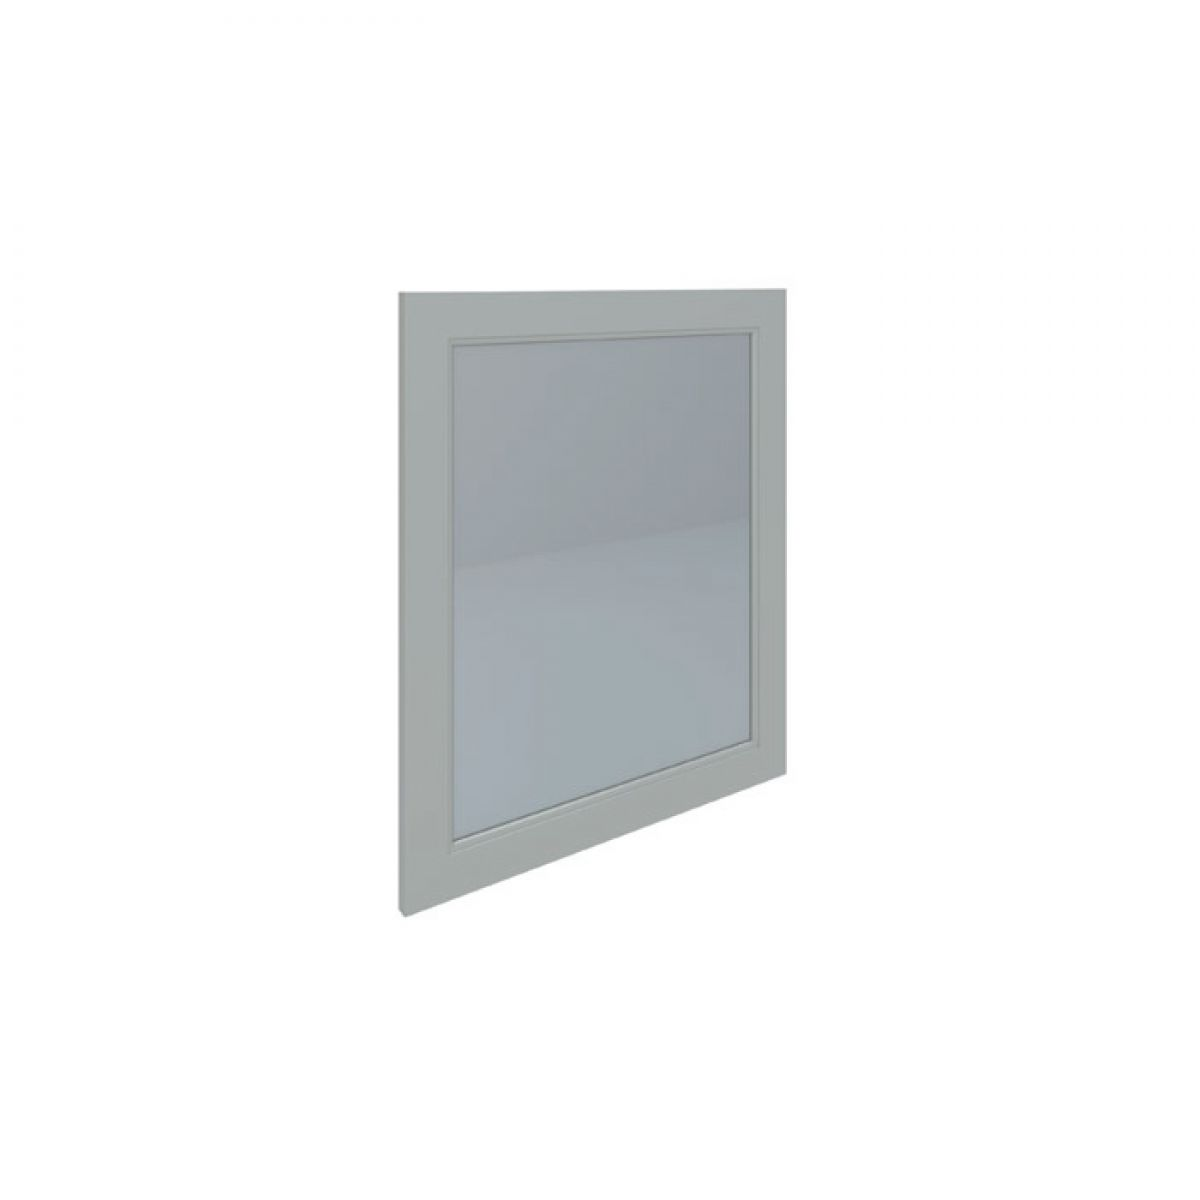 RAK Washington Greige Bathroom Mirror 650mm